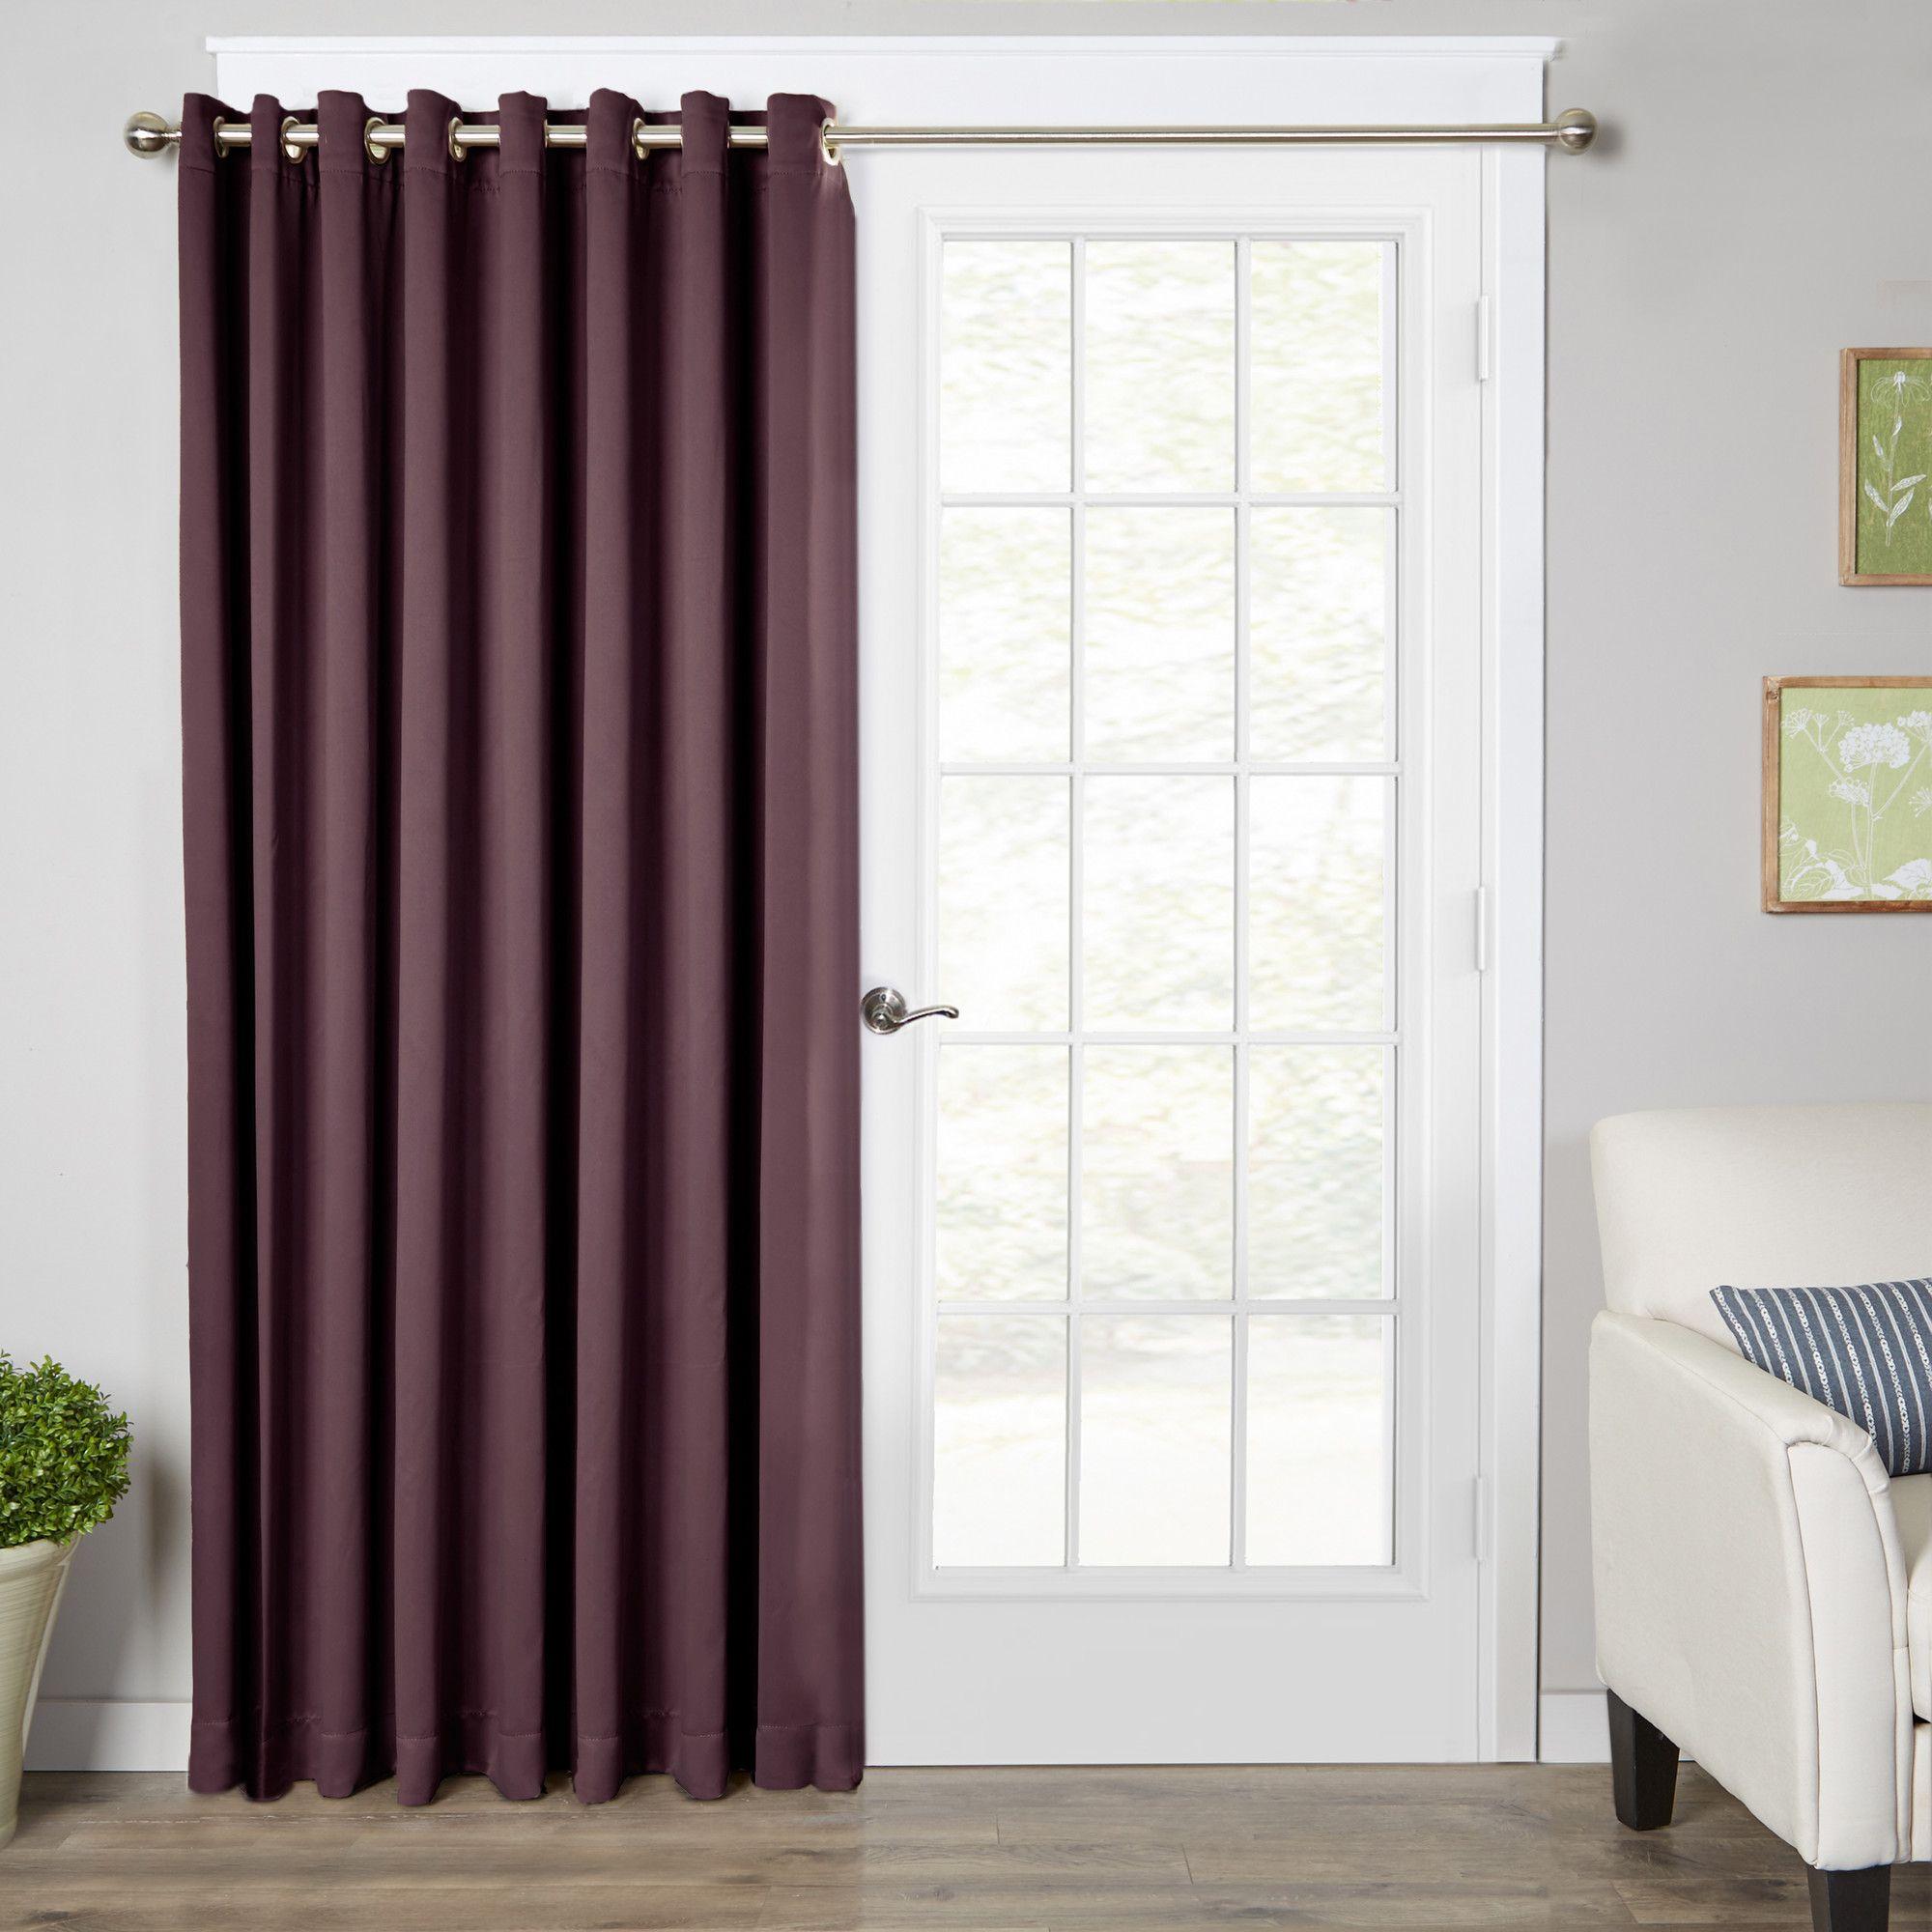 Solid Room Darkening Grommet Single Curtain Panel Patio Doors And